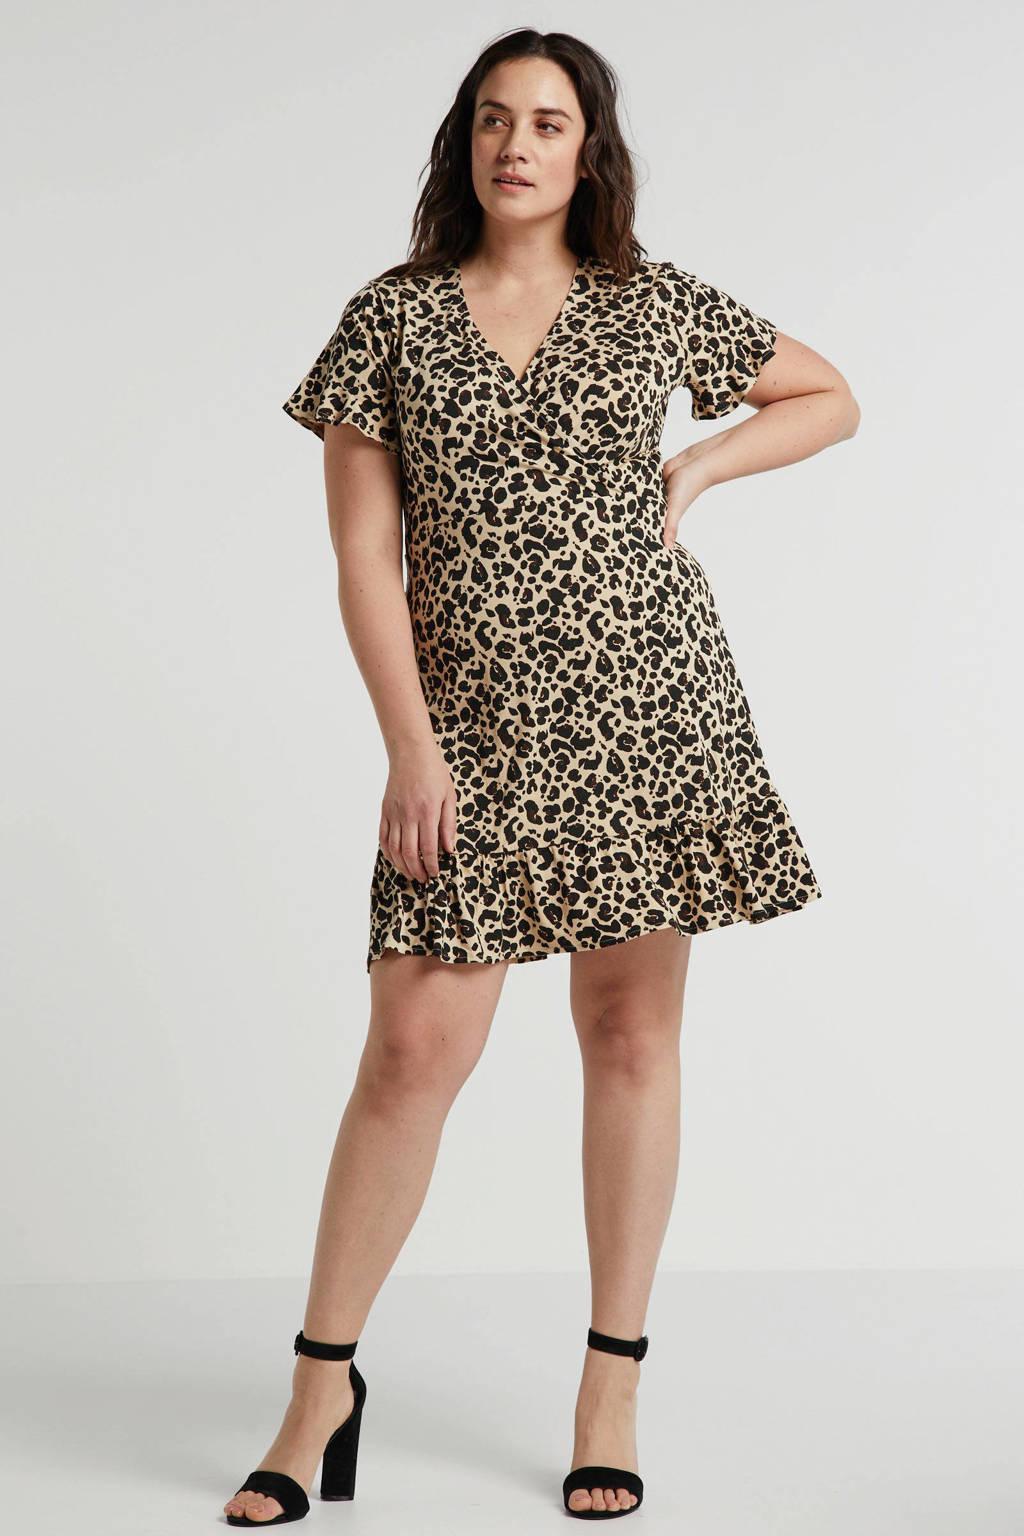 anytime jurk Plus size met ruches en panterprint beige/zwart, Beige/zwart